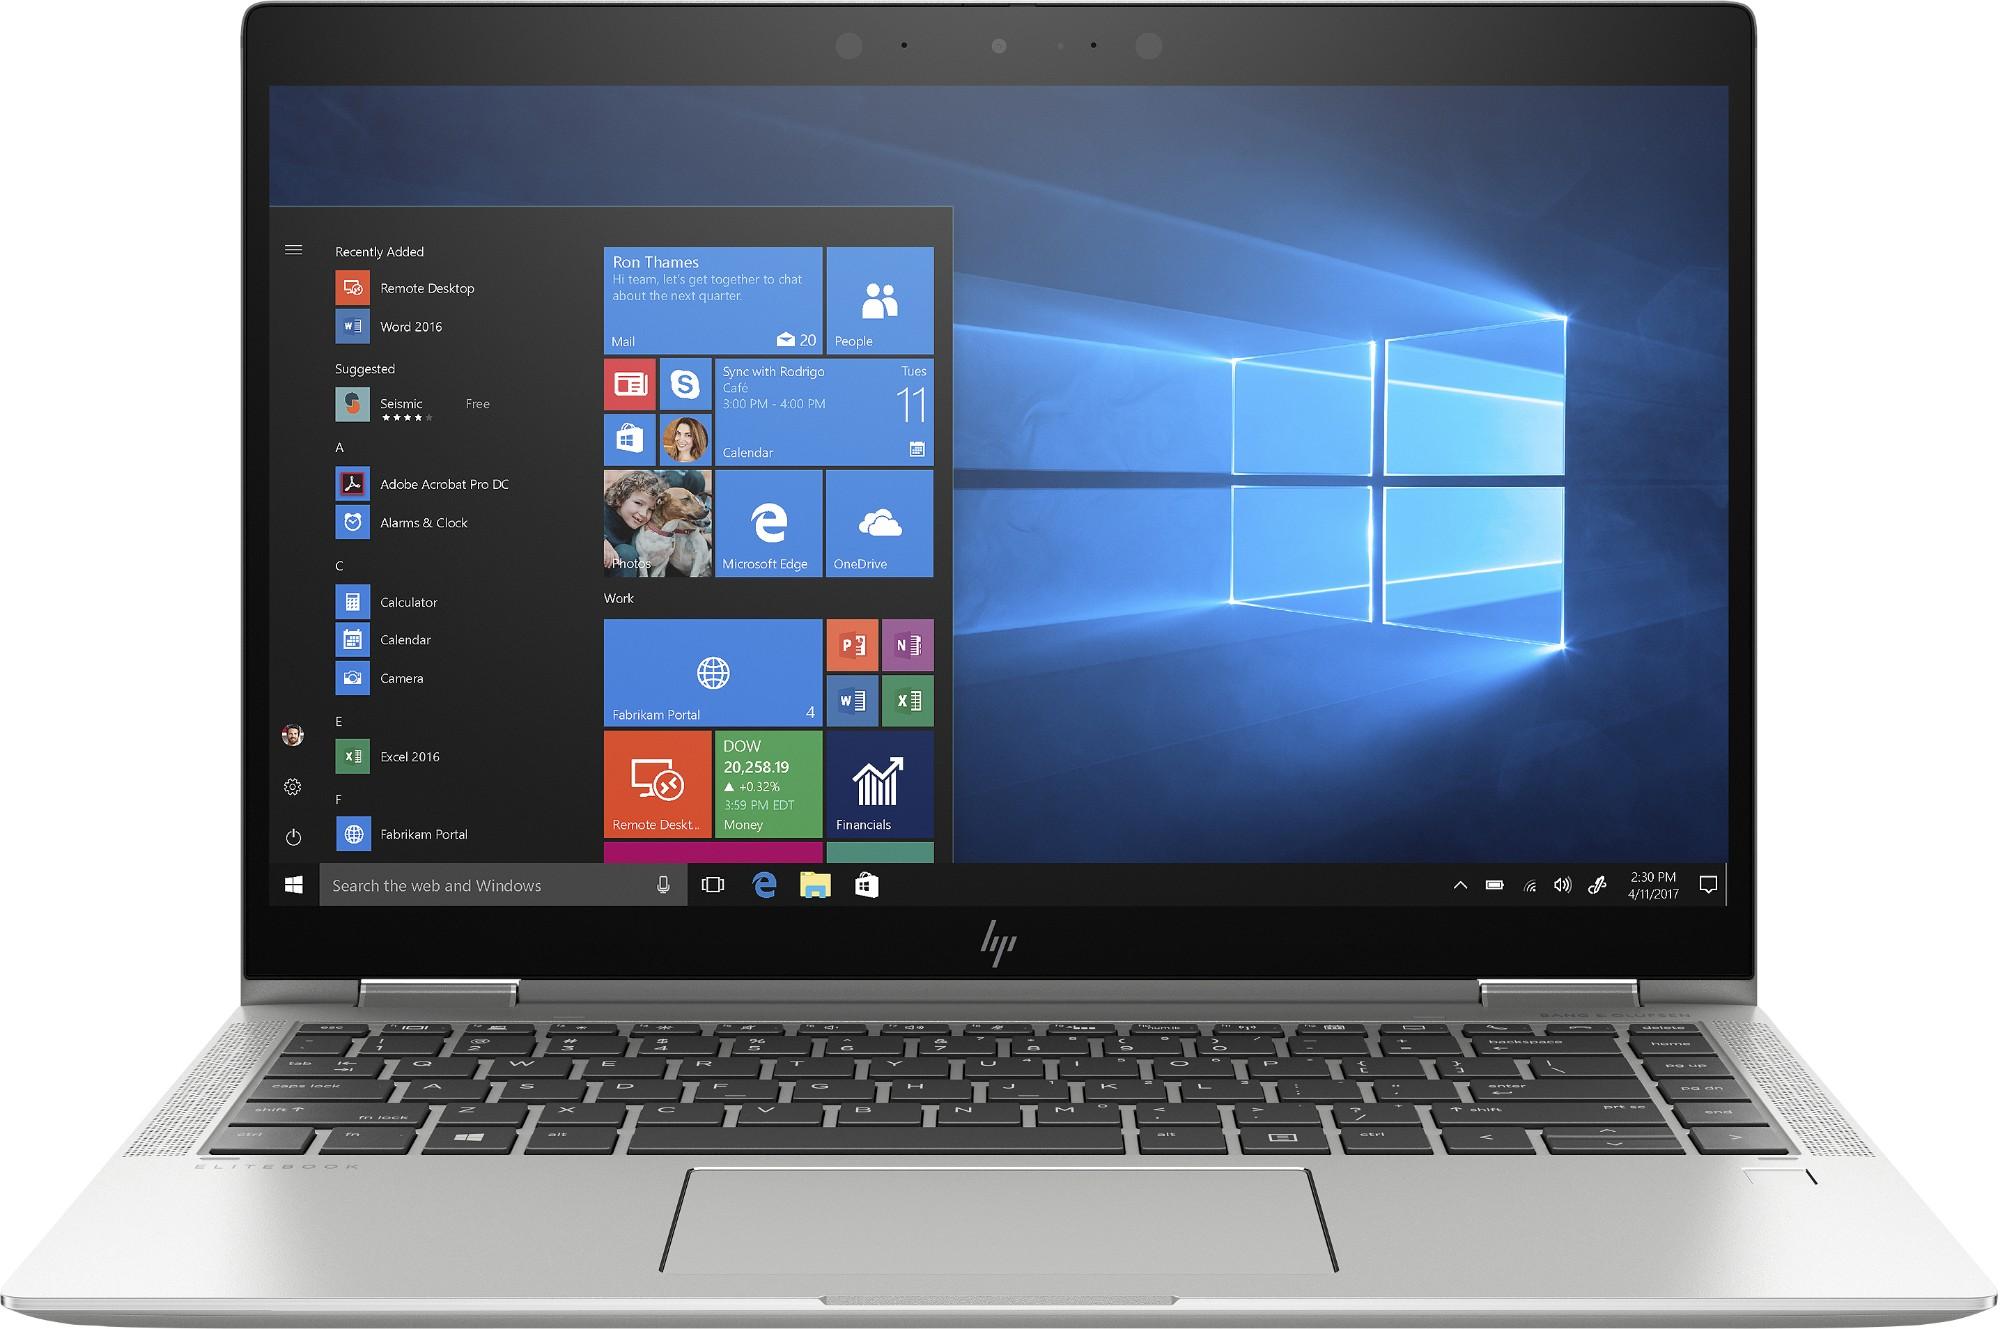 "HP EliteBook x360 1040 G6 Híbrido (2-en-1) Plata 35,6 cm (14"") 1920 x 1080 Pixeles Pantalla táctil 8ª generación de procesadores Intel® Core™ i5 16 GB DDR4-SDRAM 512 GB SSD Wi-Fi 6 (802.11ax) Windows 10 Pro"